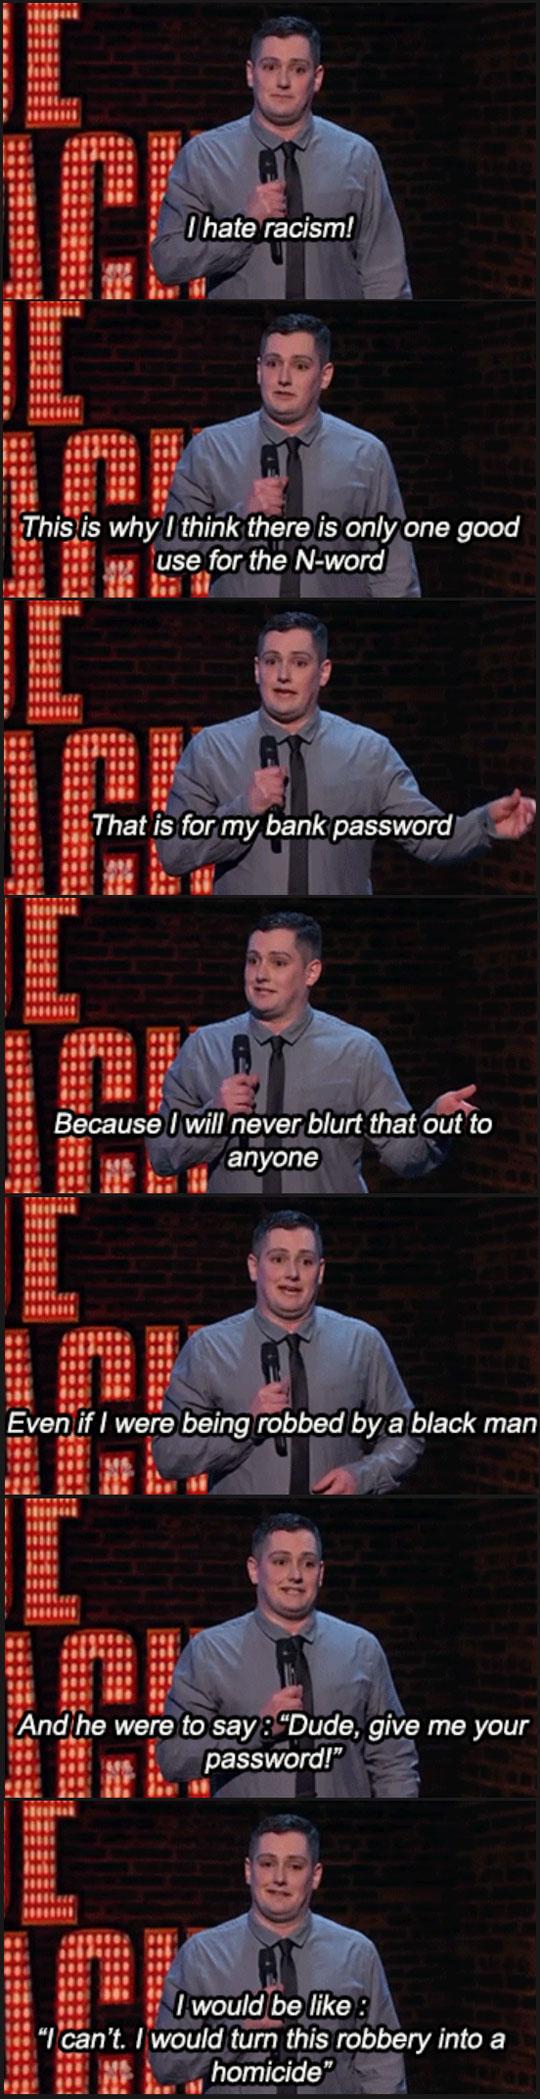 The Best ATM Password